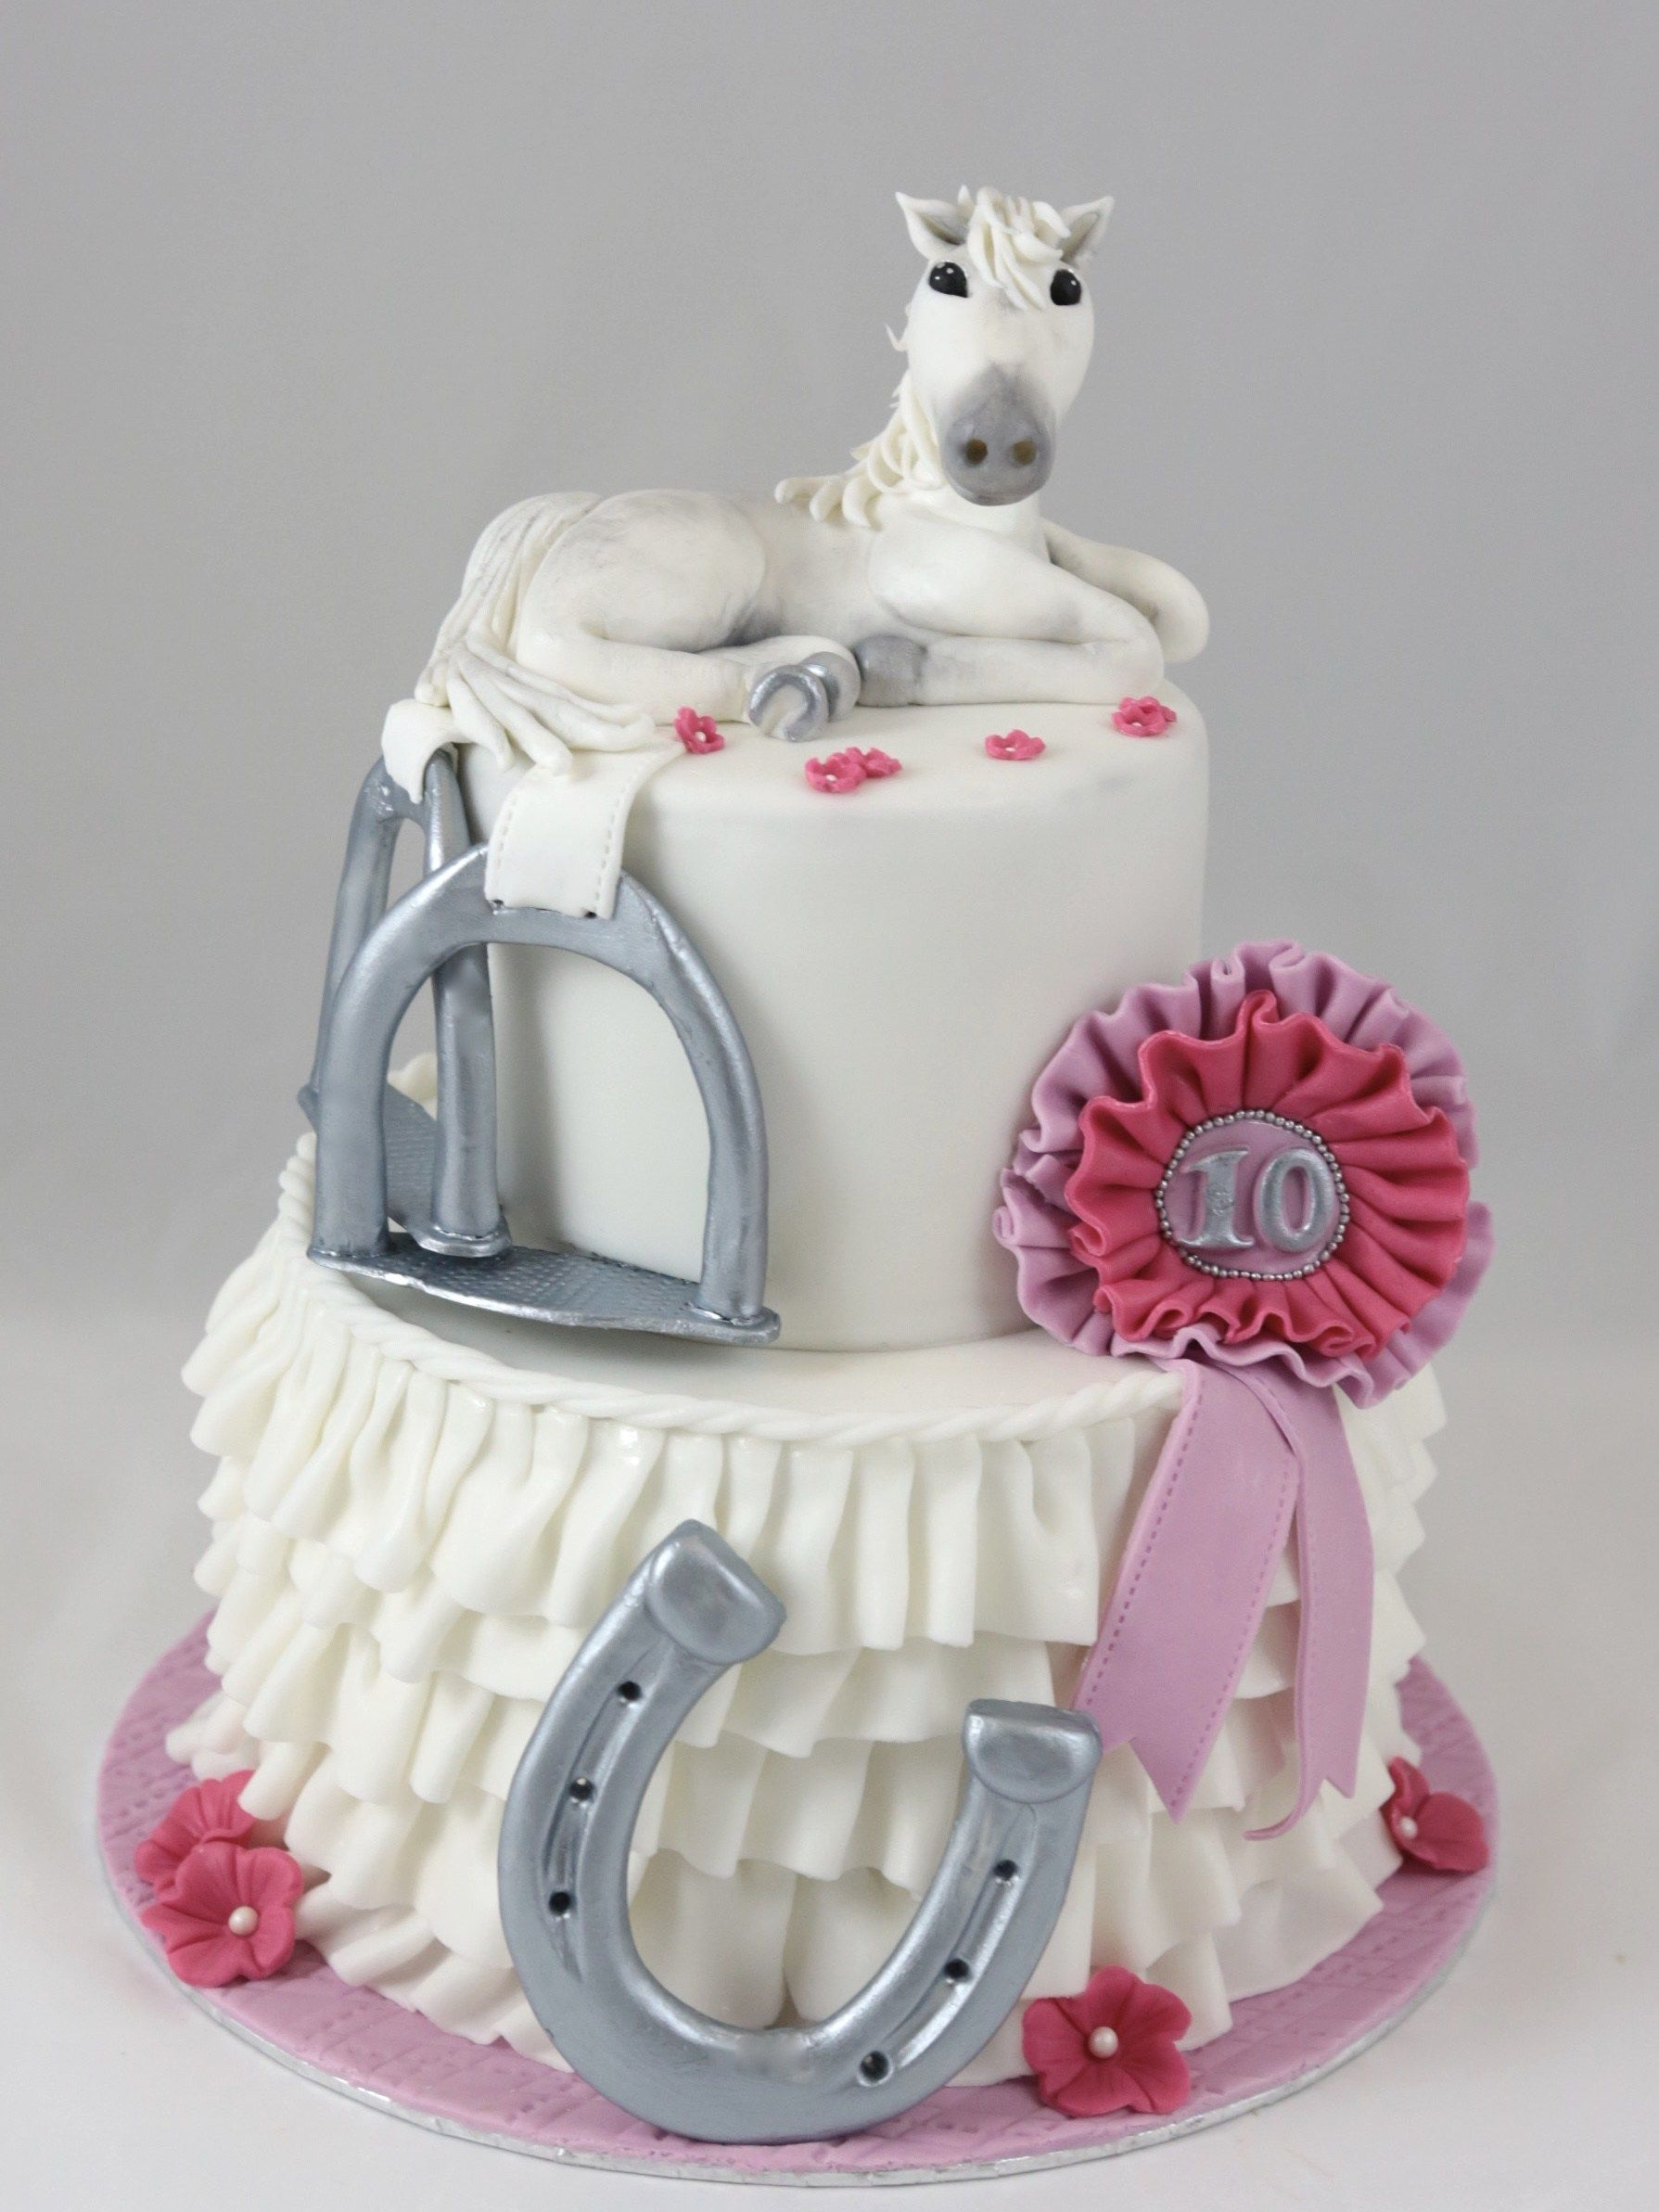 pferd horse cake fondant girl birthday m dchen geburtstag torte kindergeburtstag pinterest. Black Bedroom Furniture Sets. Home Design Ideas